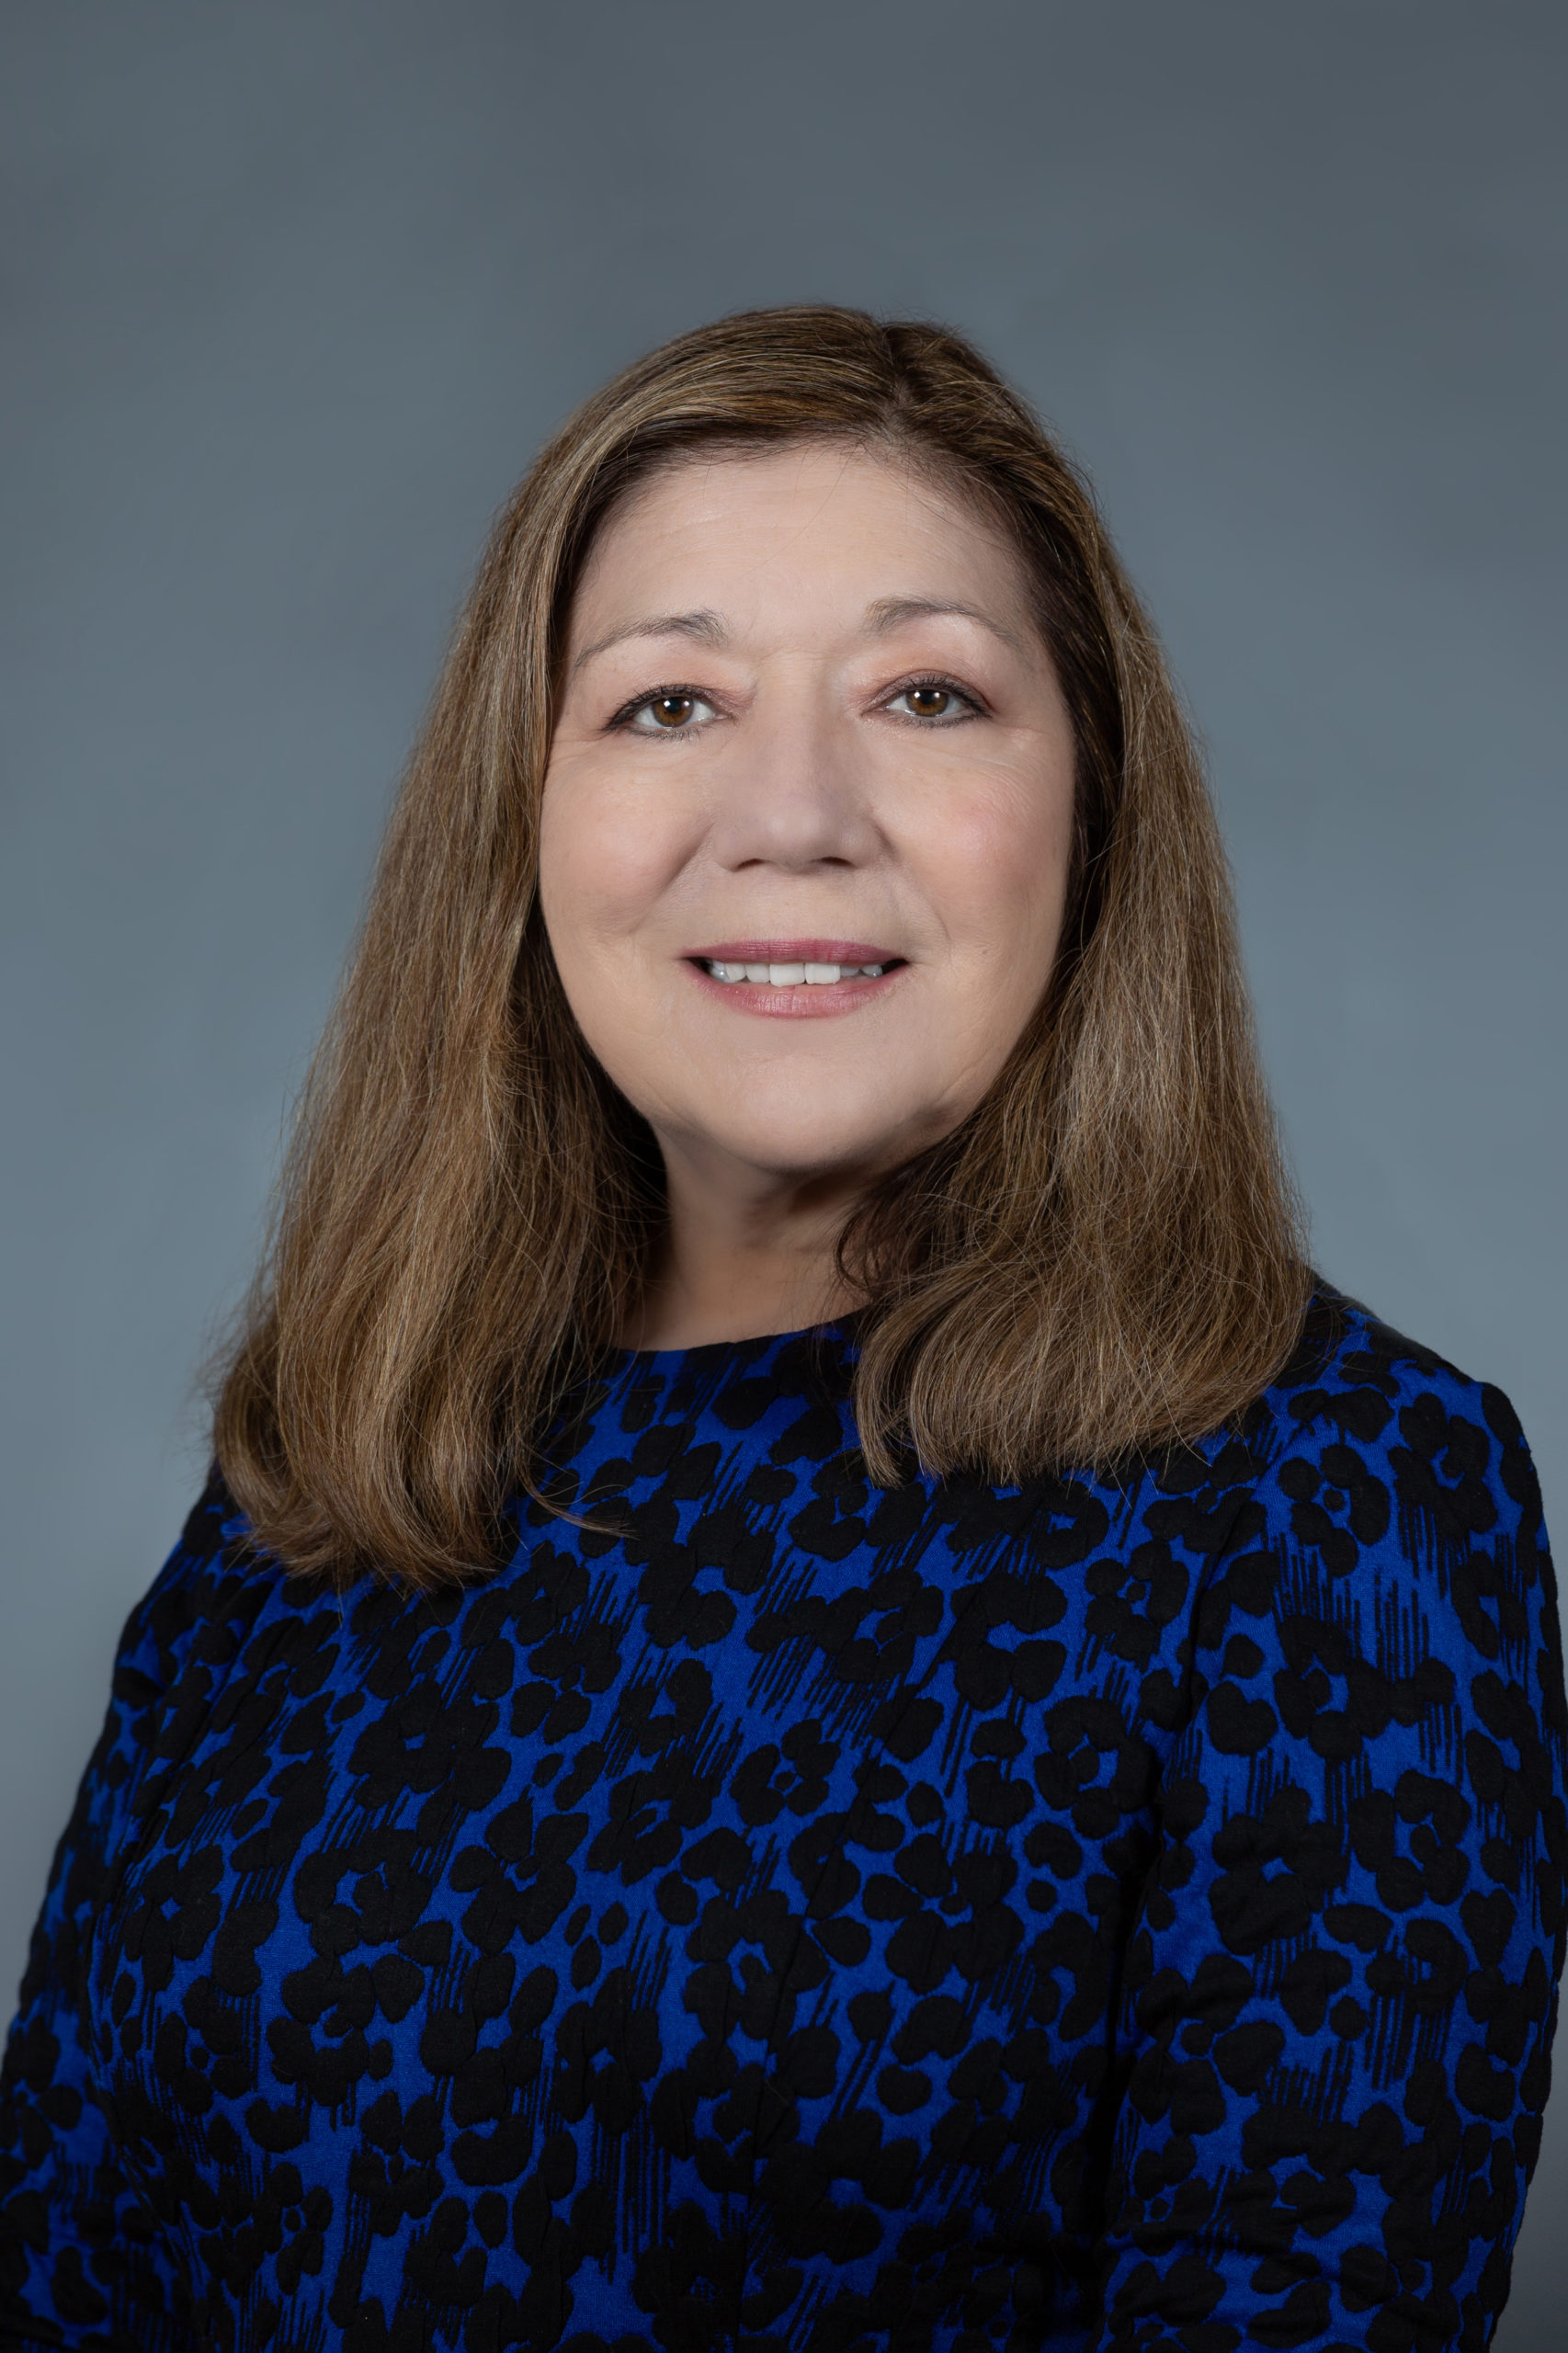 Rafaela Ortiz